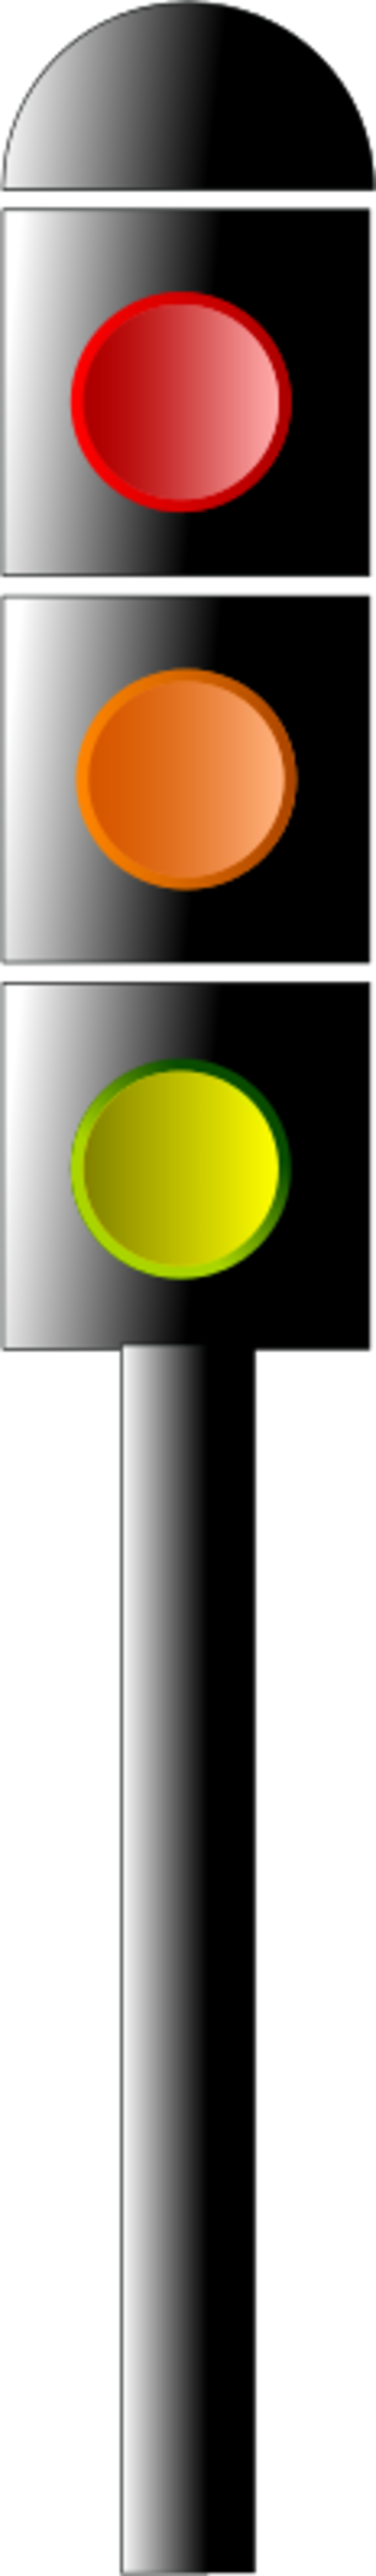 Traffic semaphore signal light.